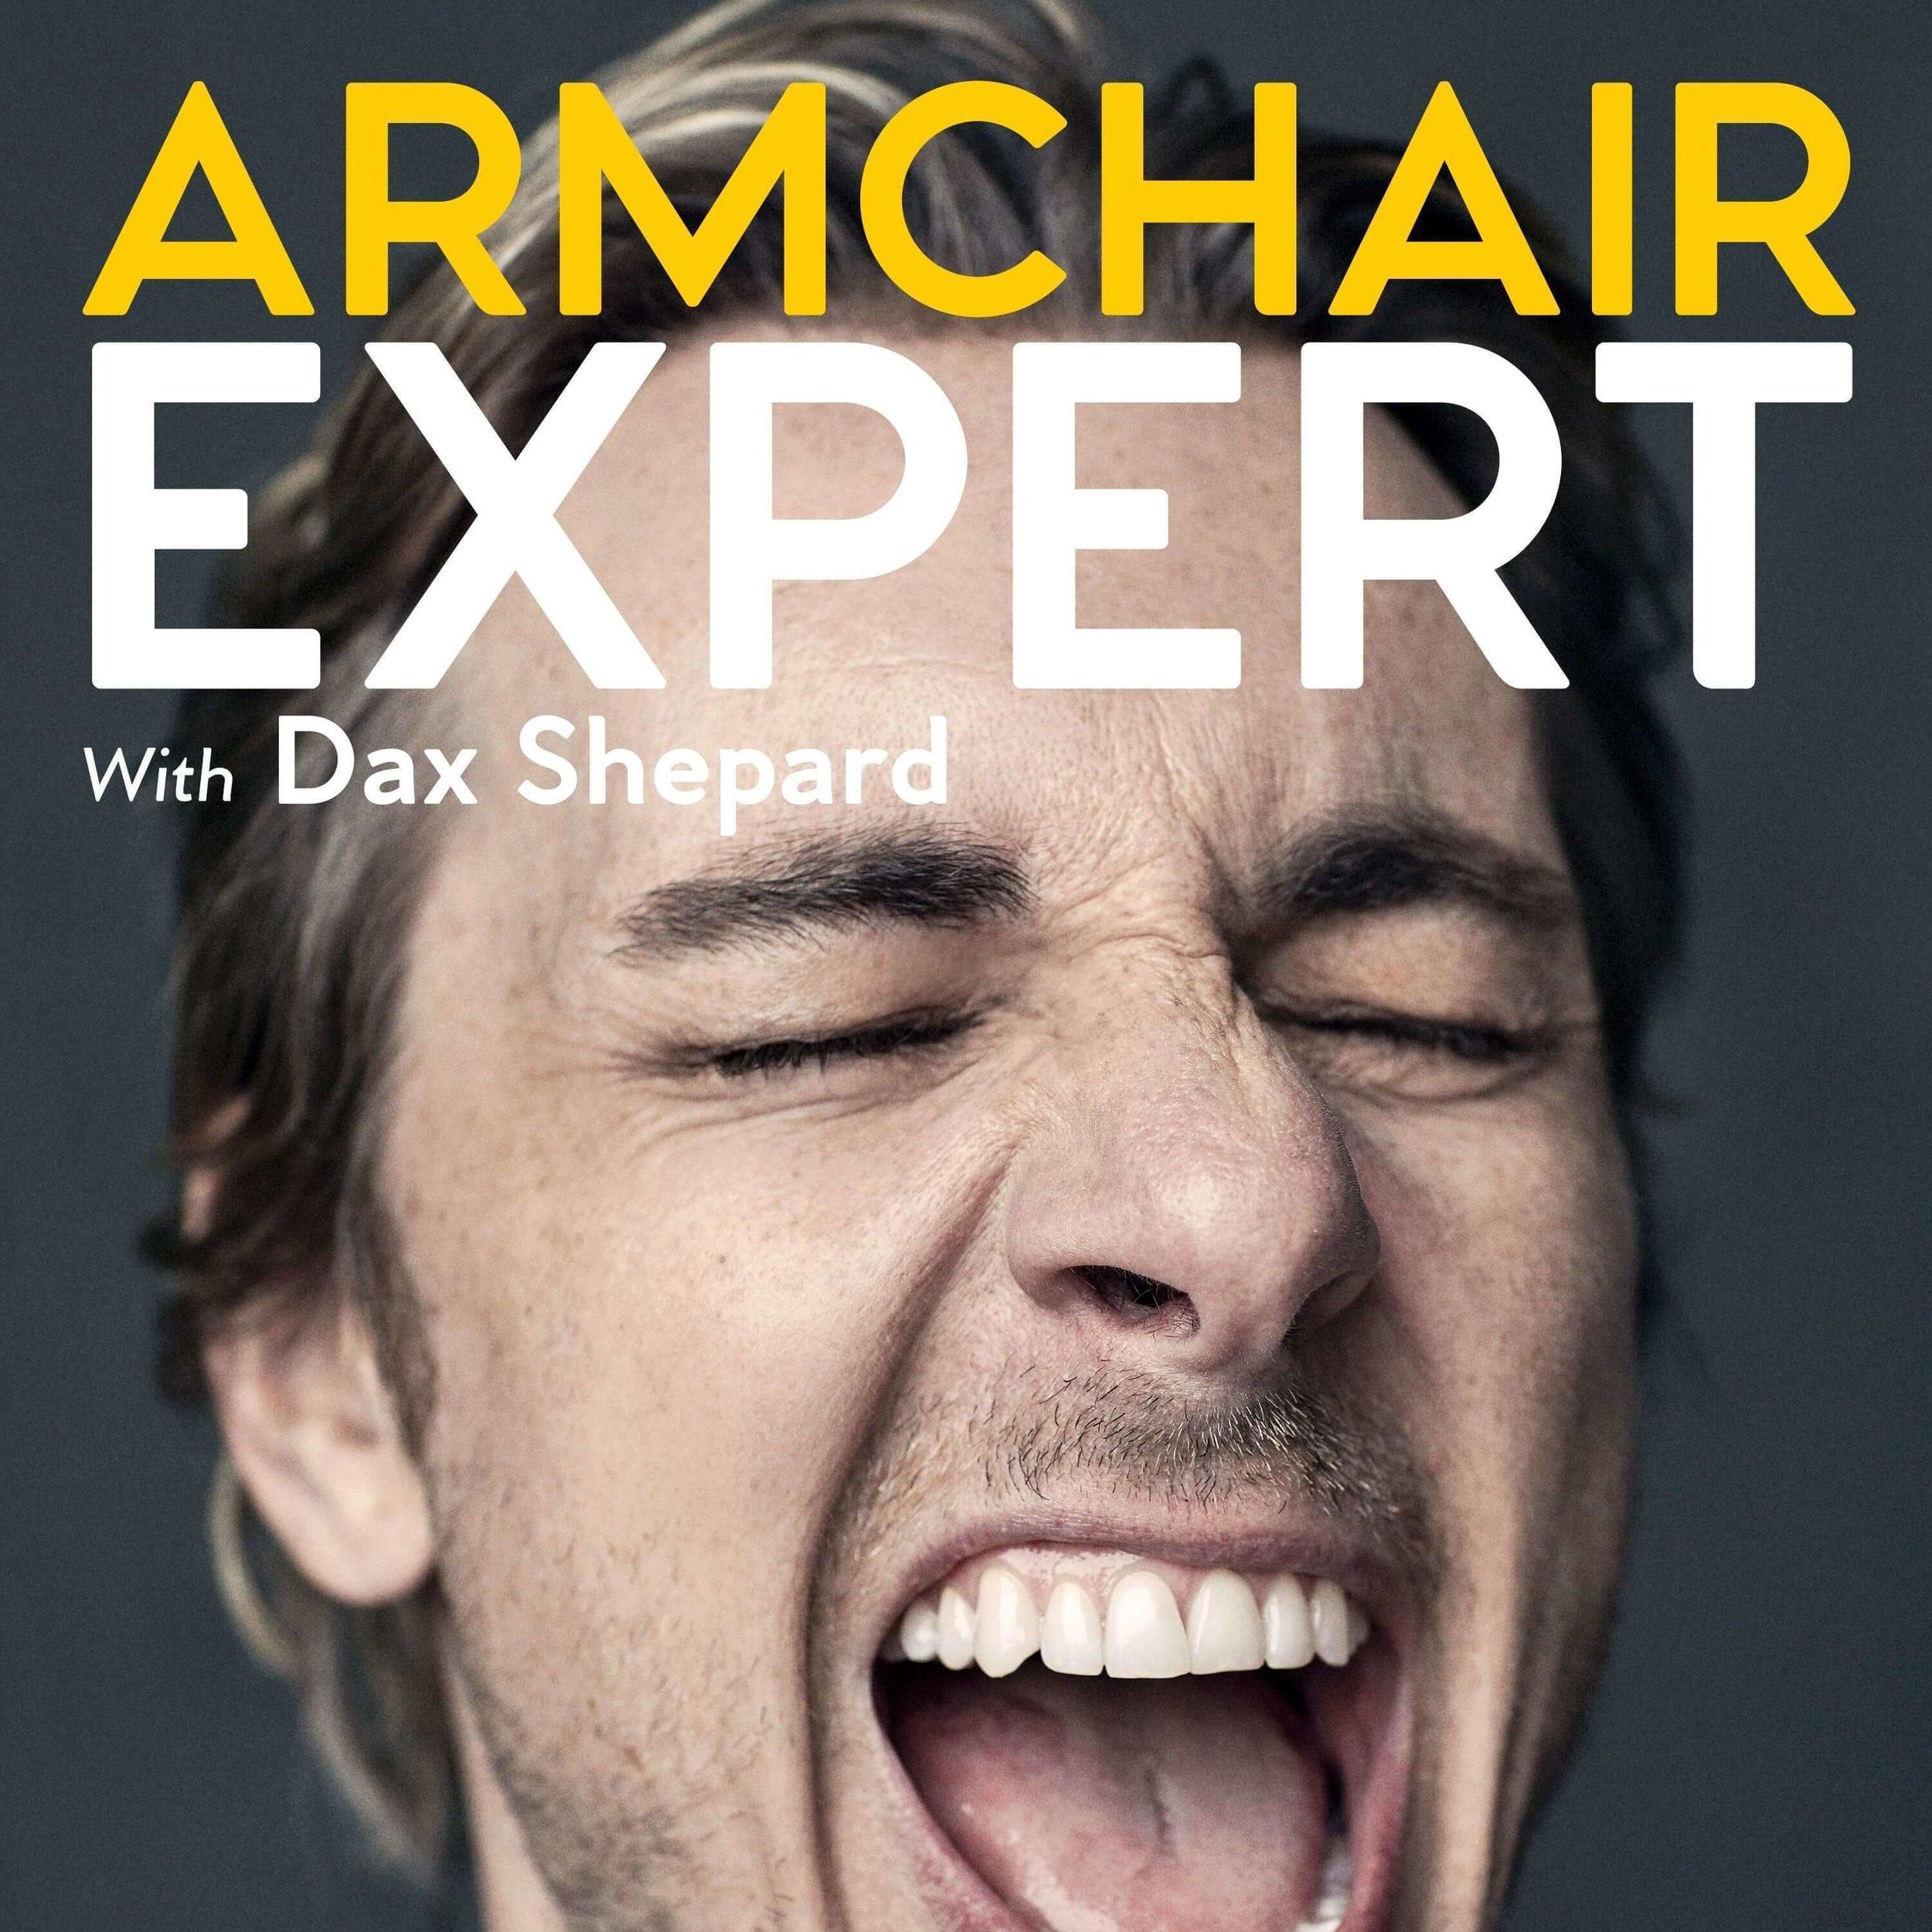 Armchair Expert with Dax Shepard -